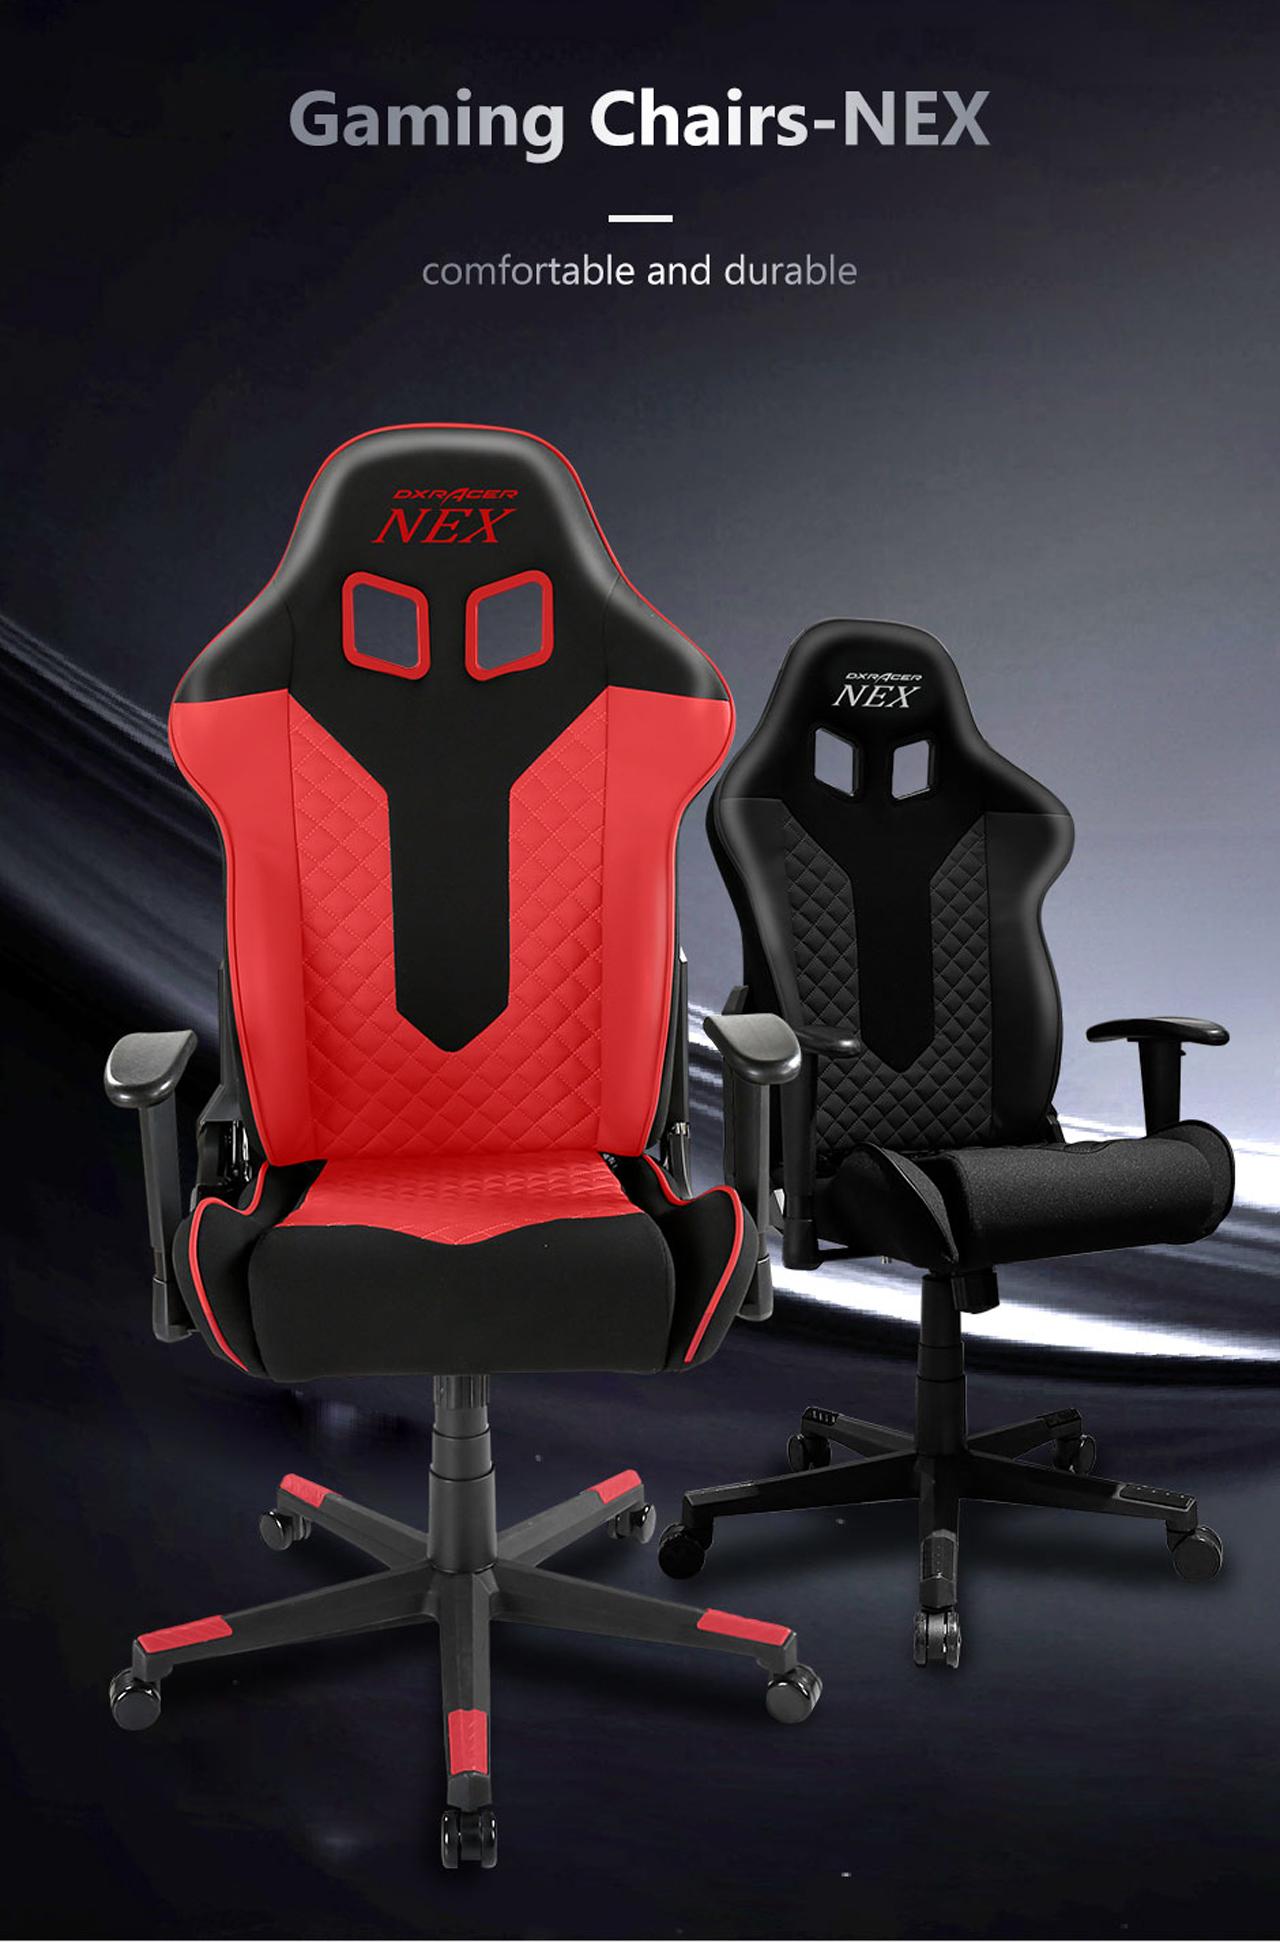 DXRacer NEX EC/OK01/NR Racing Bucket Seat Office Chair Gaming Chair  Ergonomic Computer Chair Esports Desk Chair Executive Chair Furniture -  Newegg com